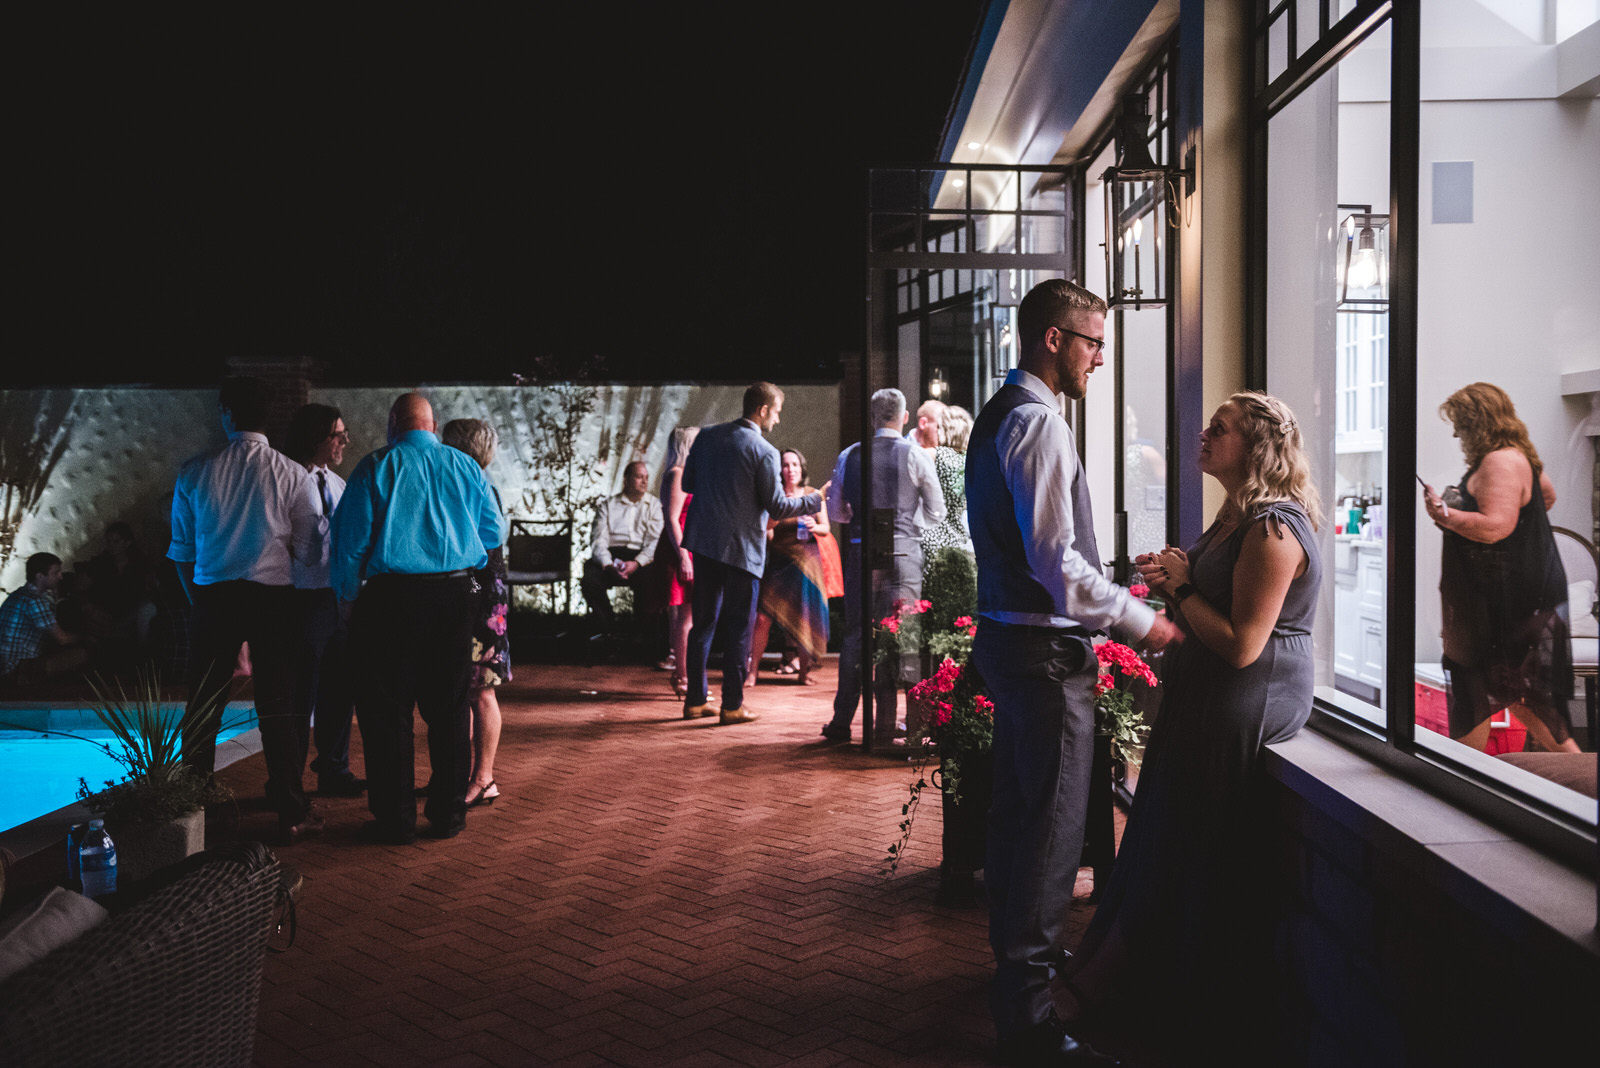 zenner house wedding in athens ohio photographer